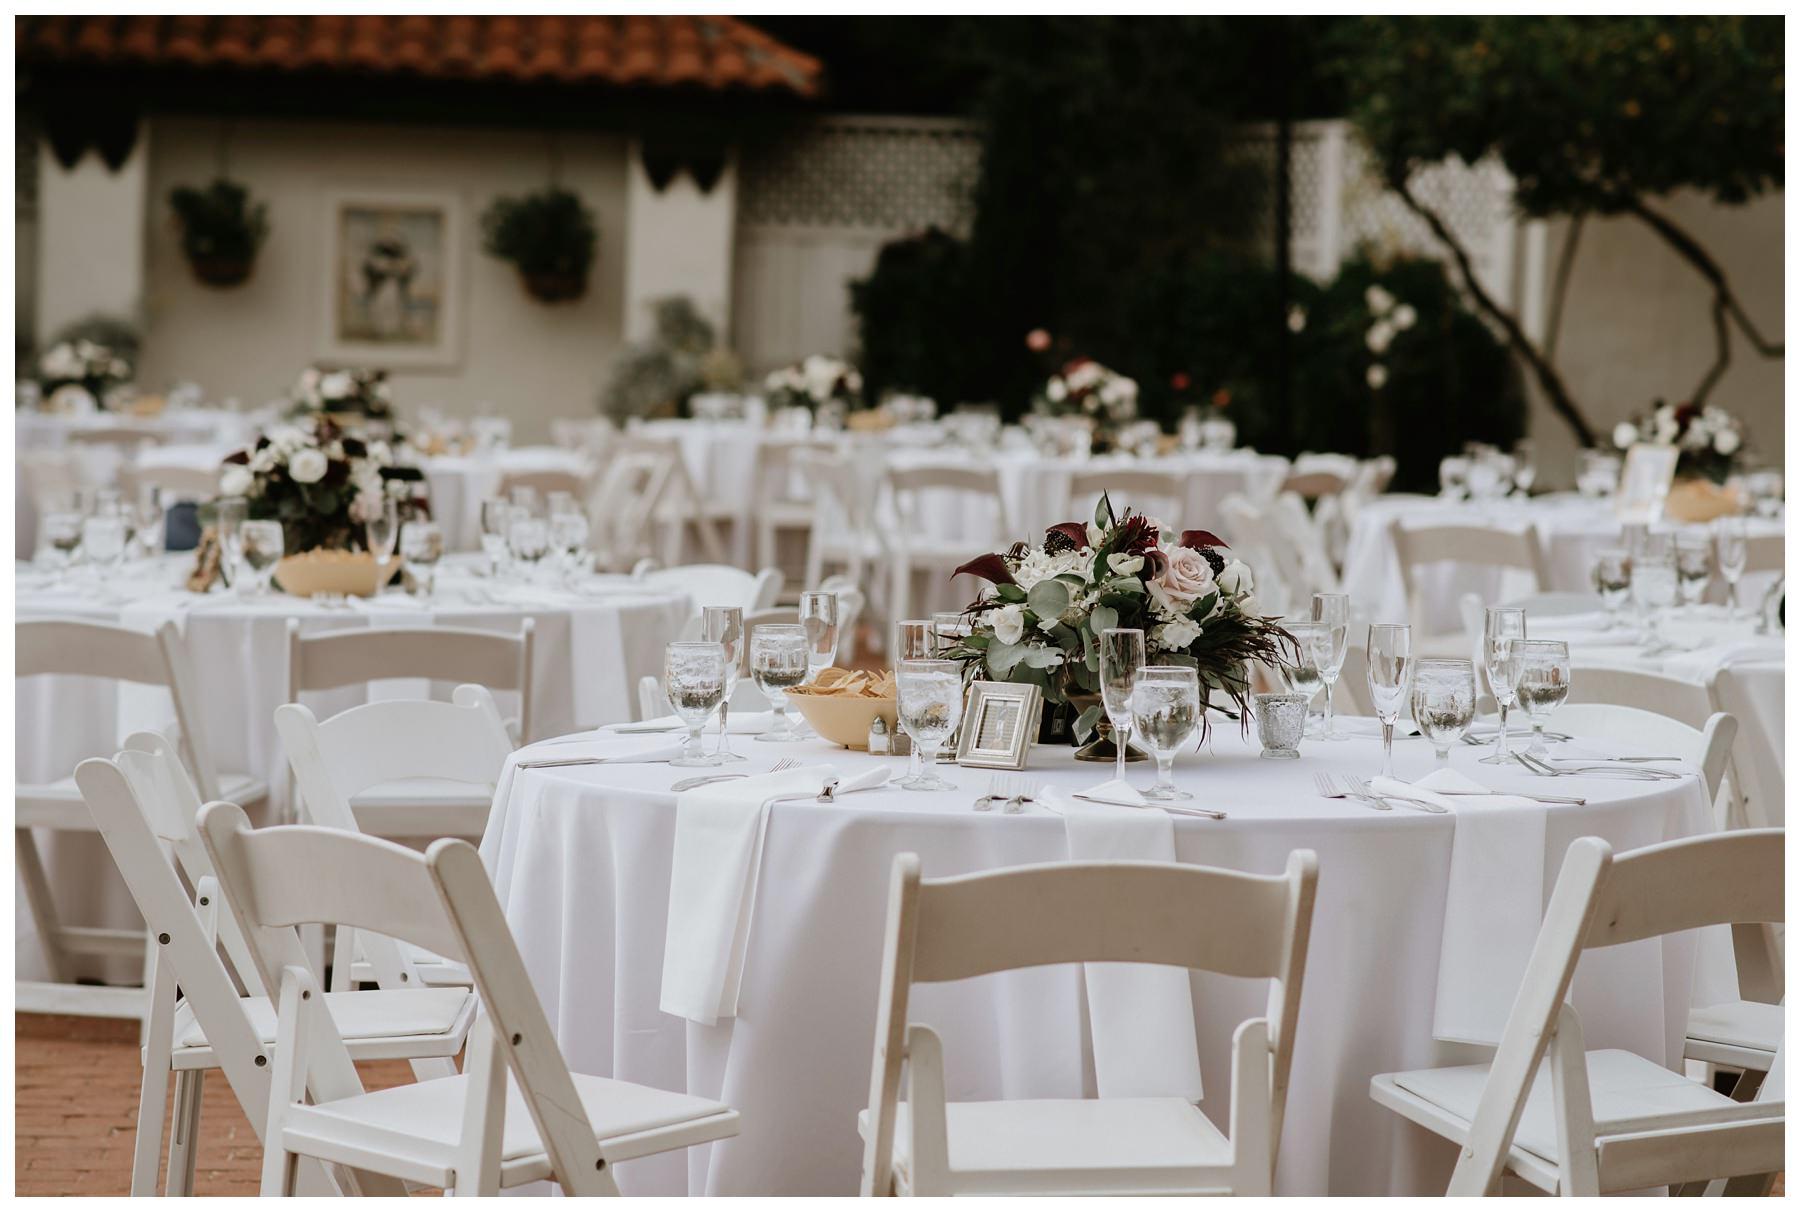 Darlington_House_Wedding_0033.jpg